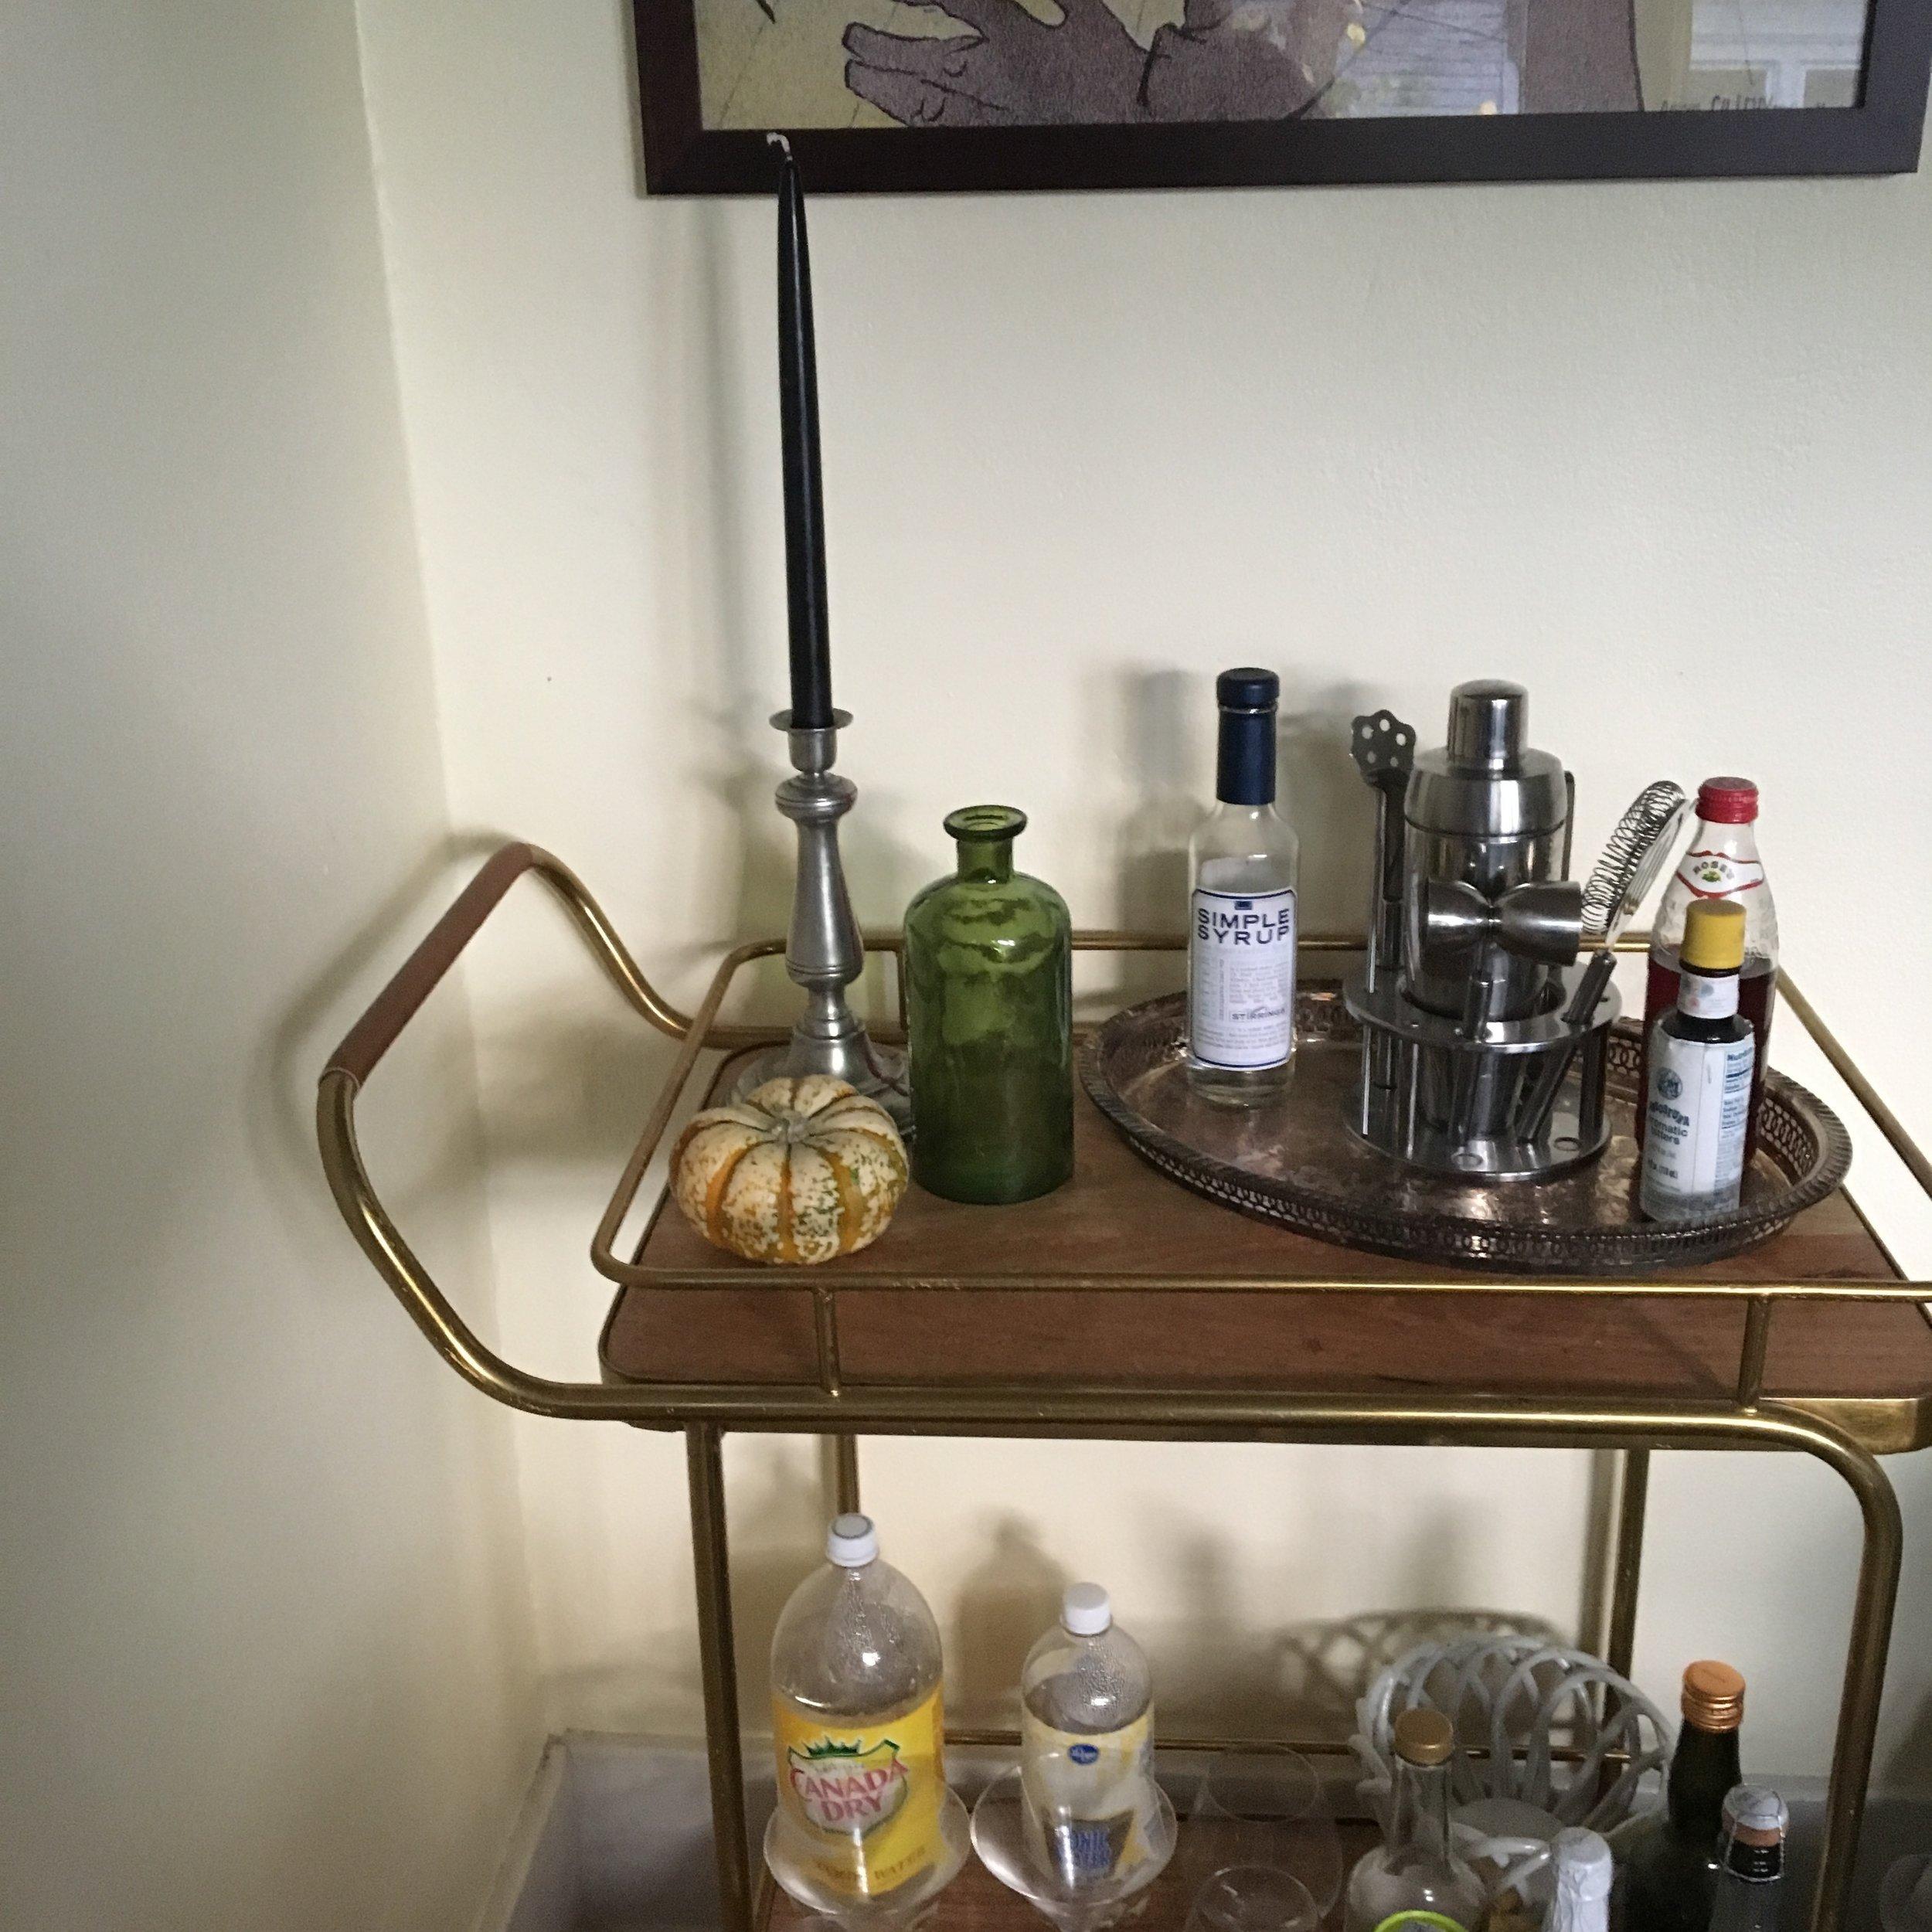 Green bottle found at TJ Maxx